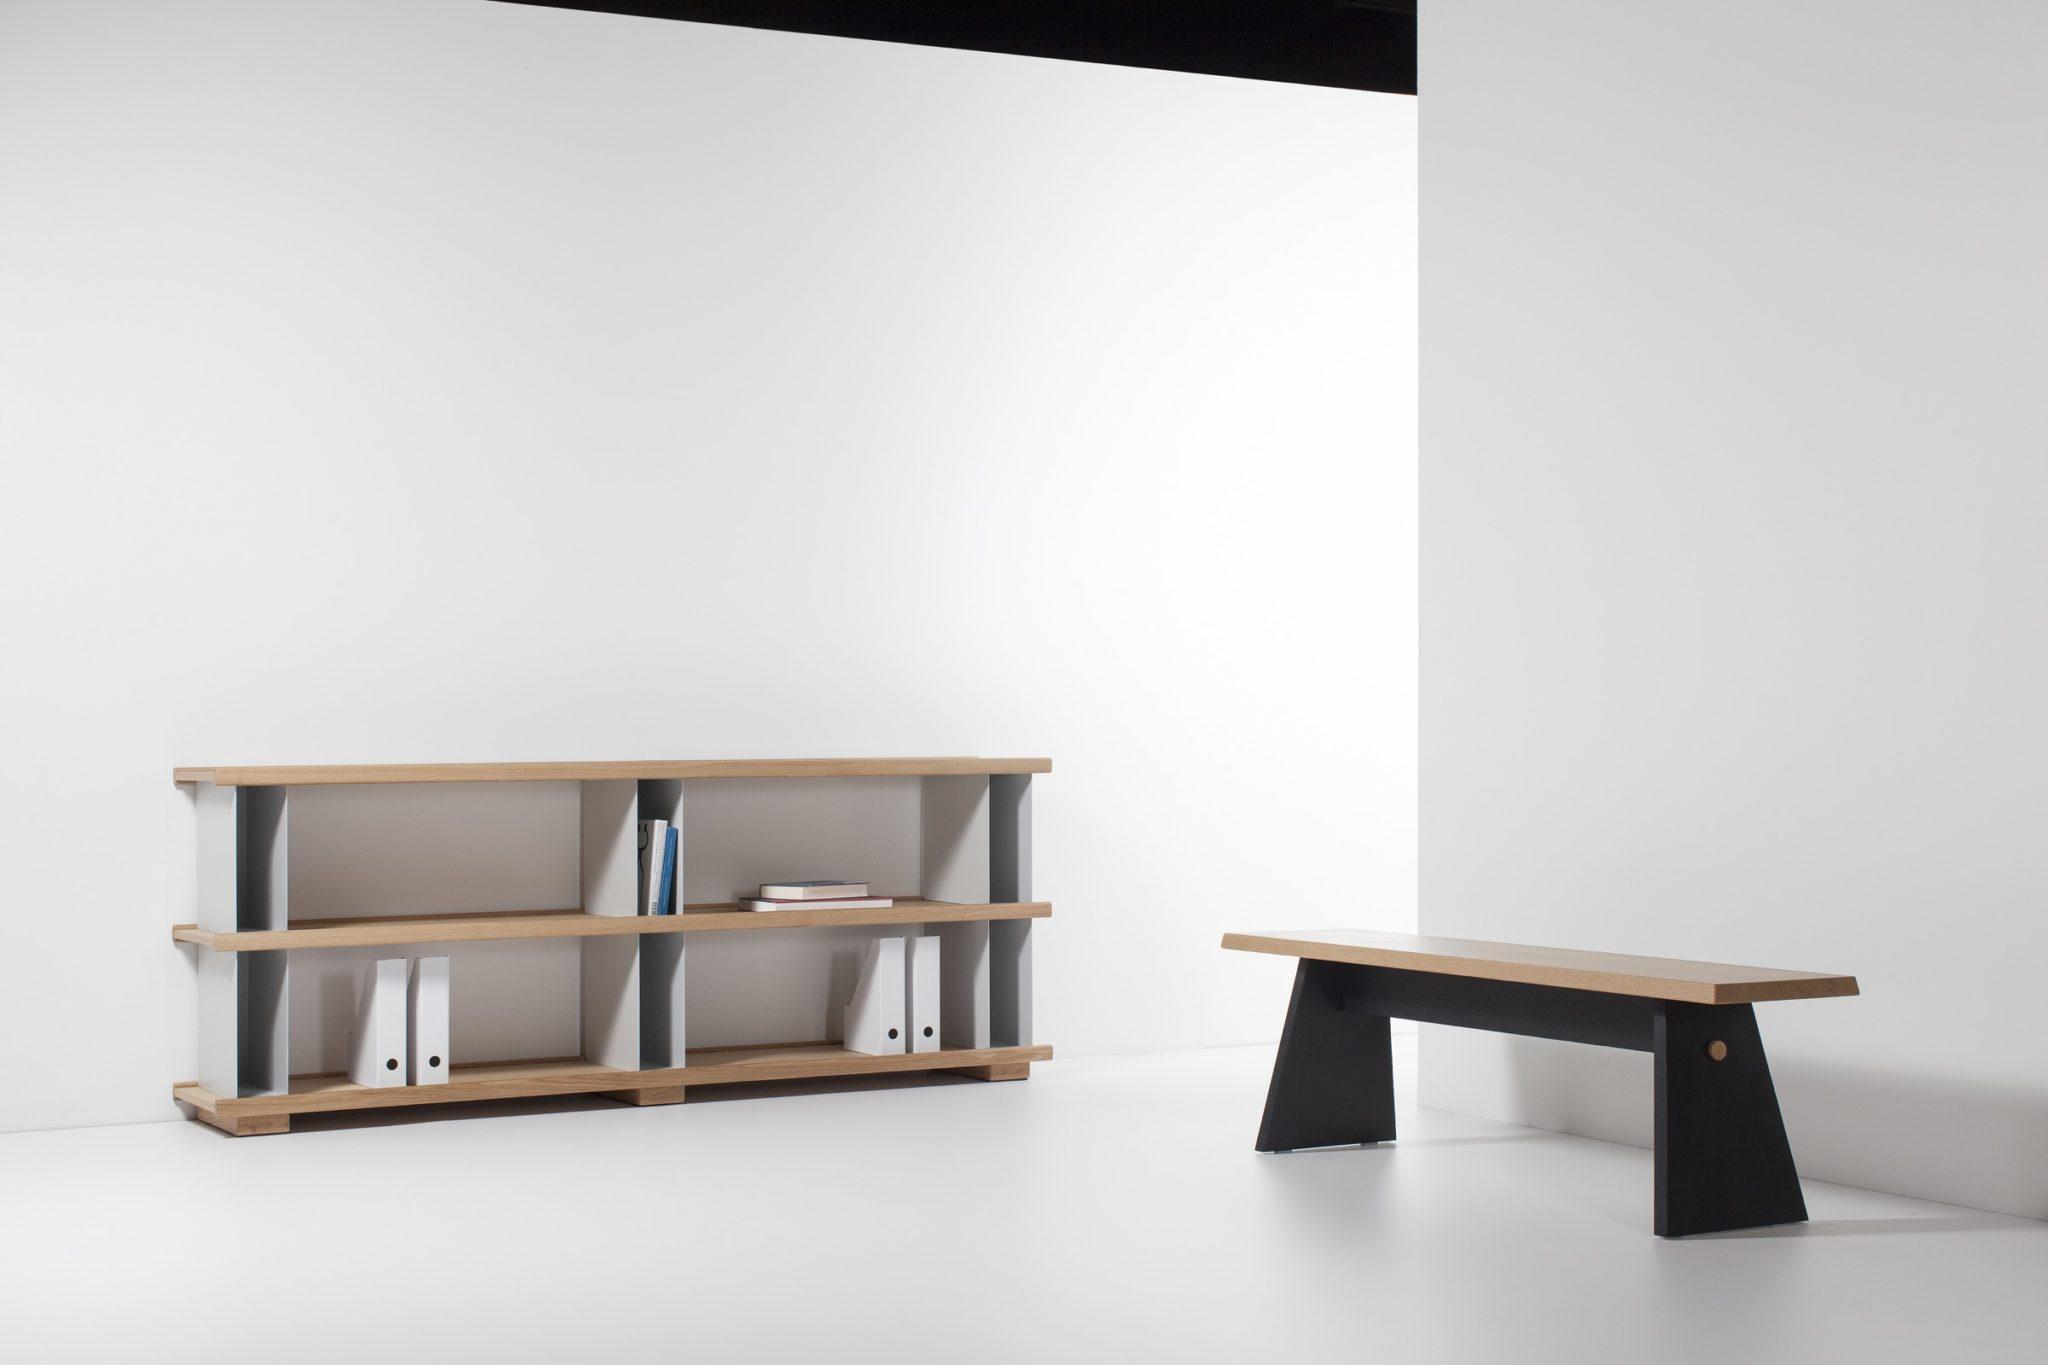 Maison et Objet 2020, Cruso Belgian wooden furniture, bench designed by Jean-François D'Or